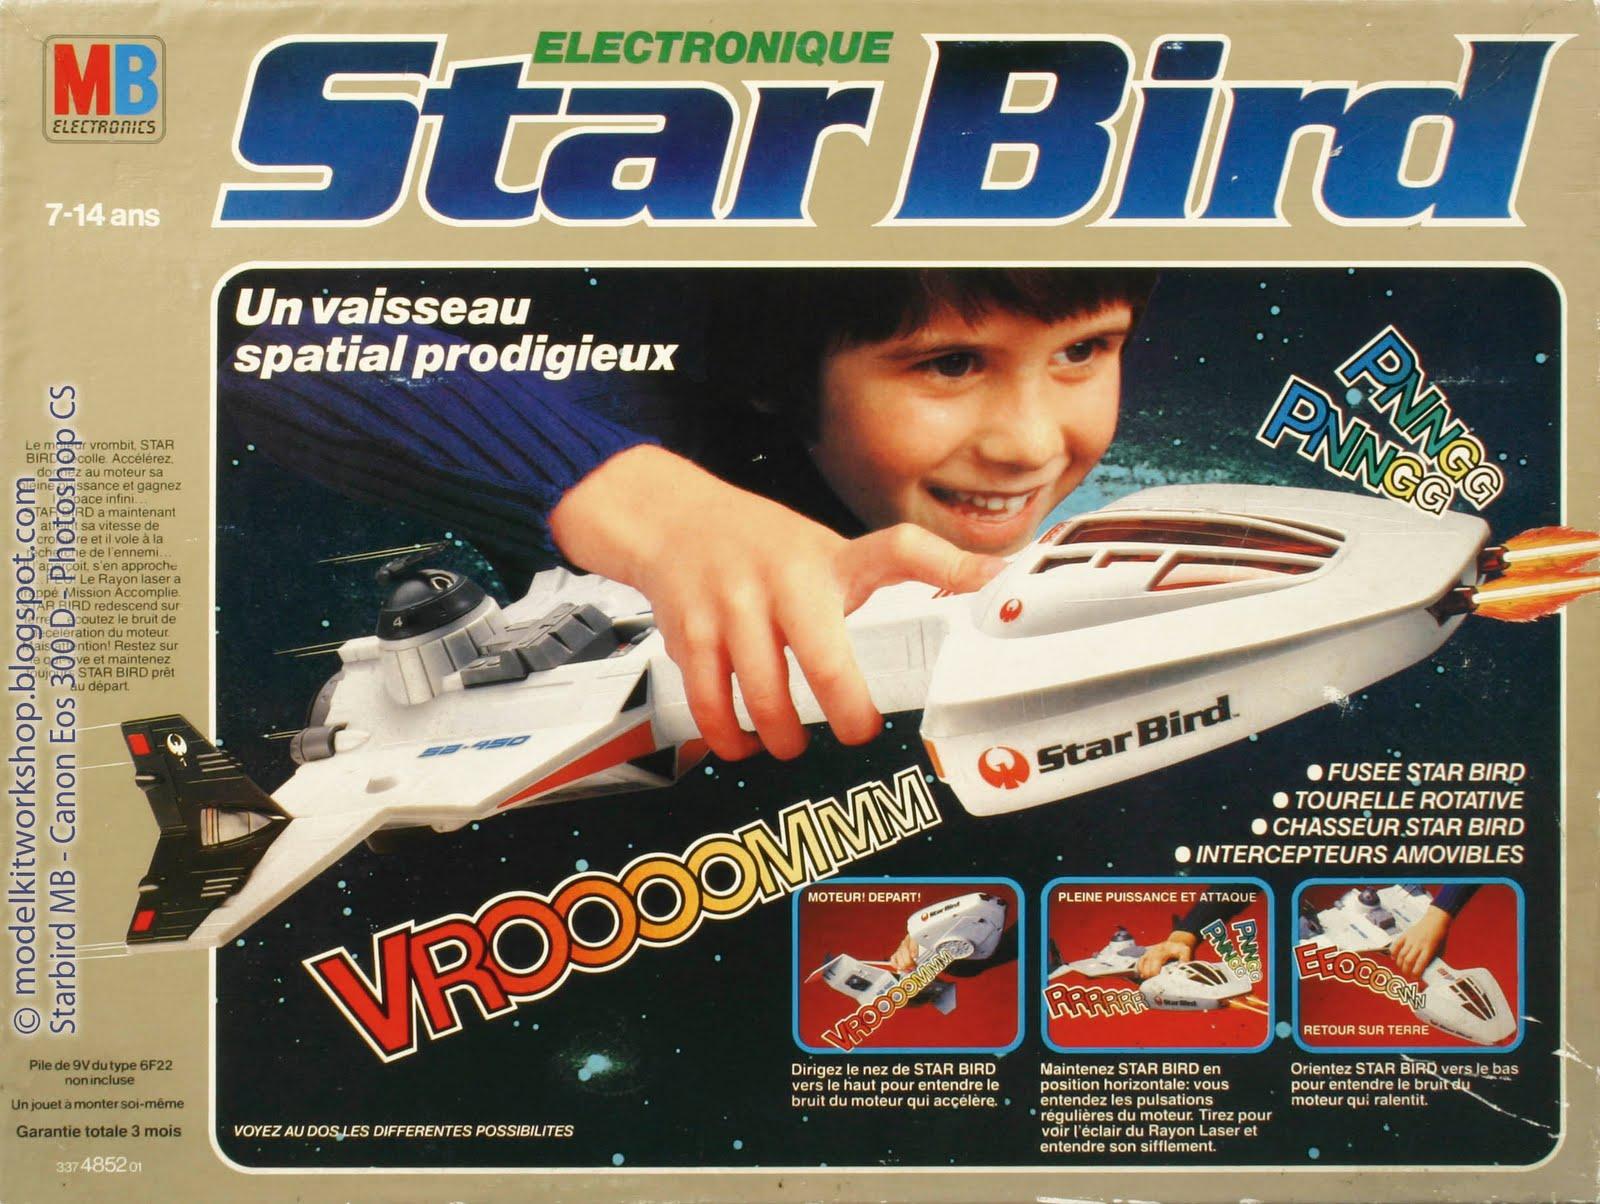 Les jouets de notre enfance. - Page 2 Starbird-Spaceship-MB-Buck-Star-Wars-05